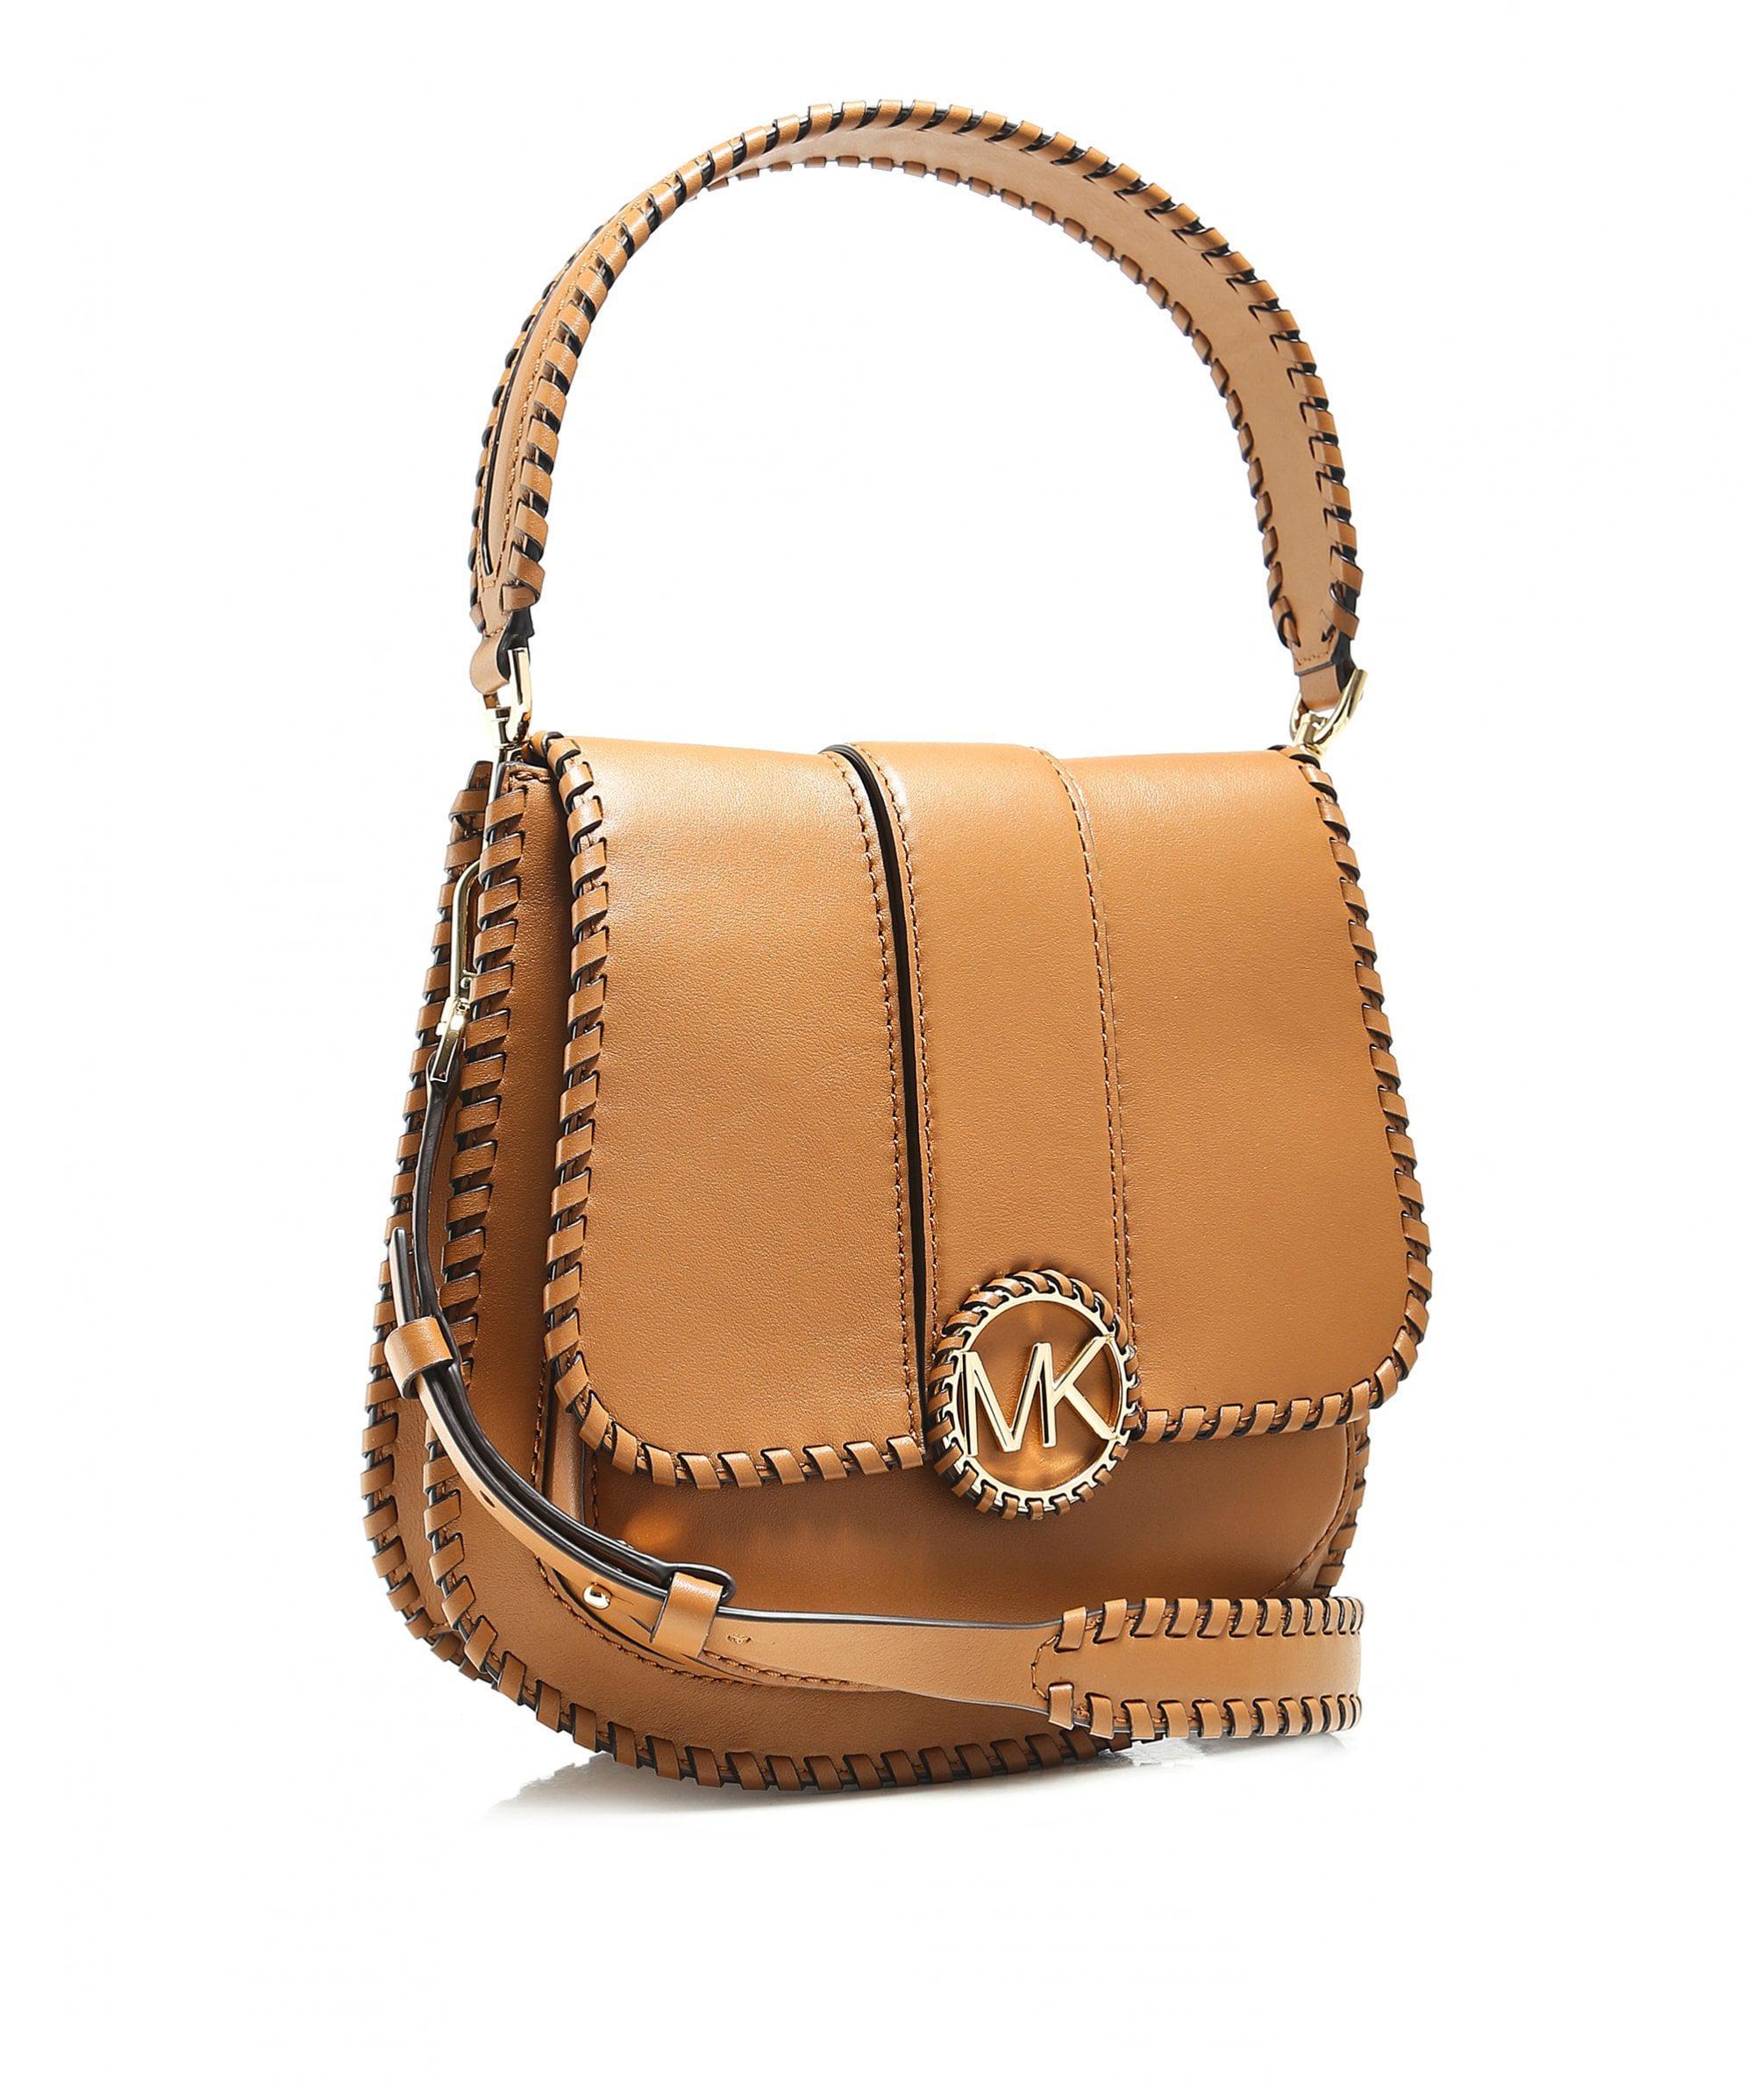 3ef2a7bdfc9b MICHAEL Michael Kors Lillie Medium Leather Shoulder Bag in Brown - Lyst